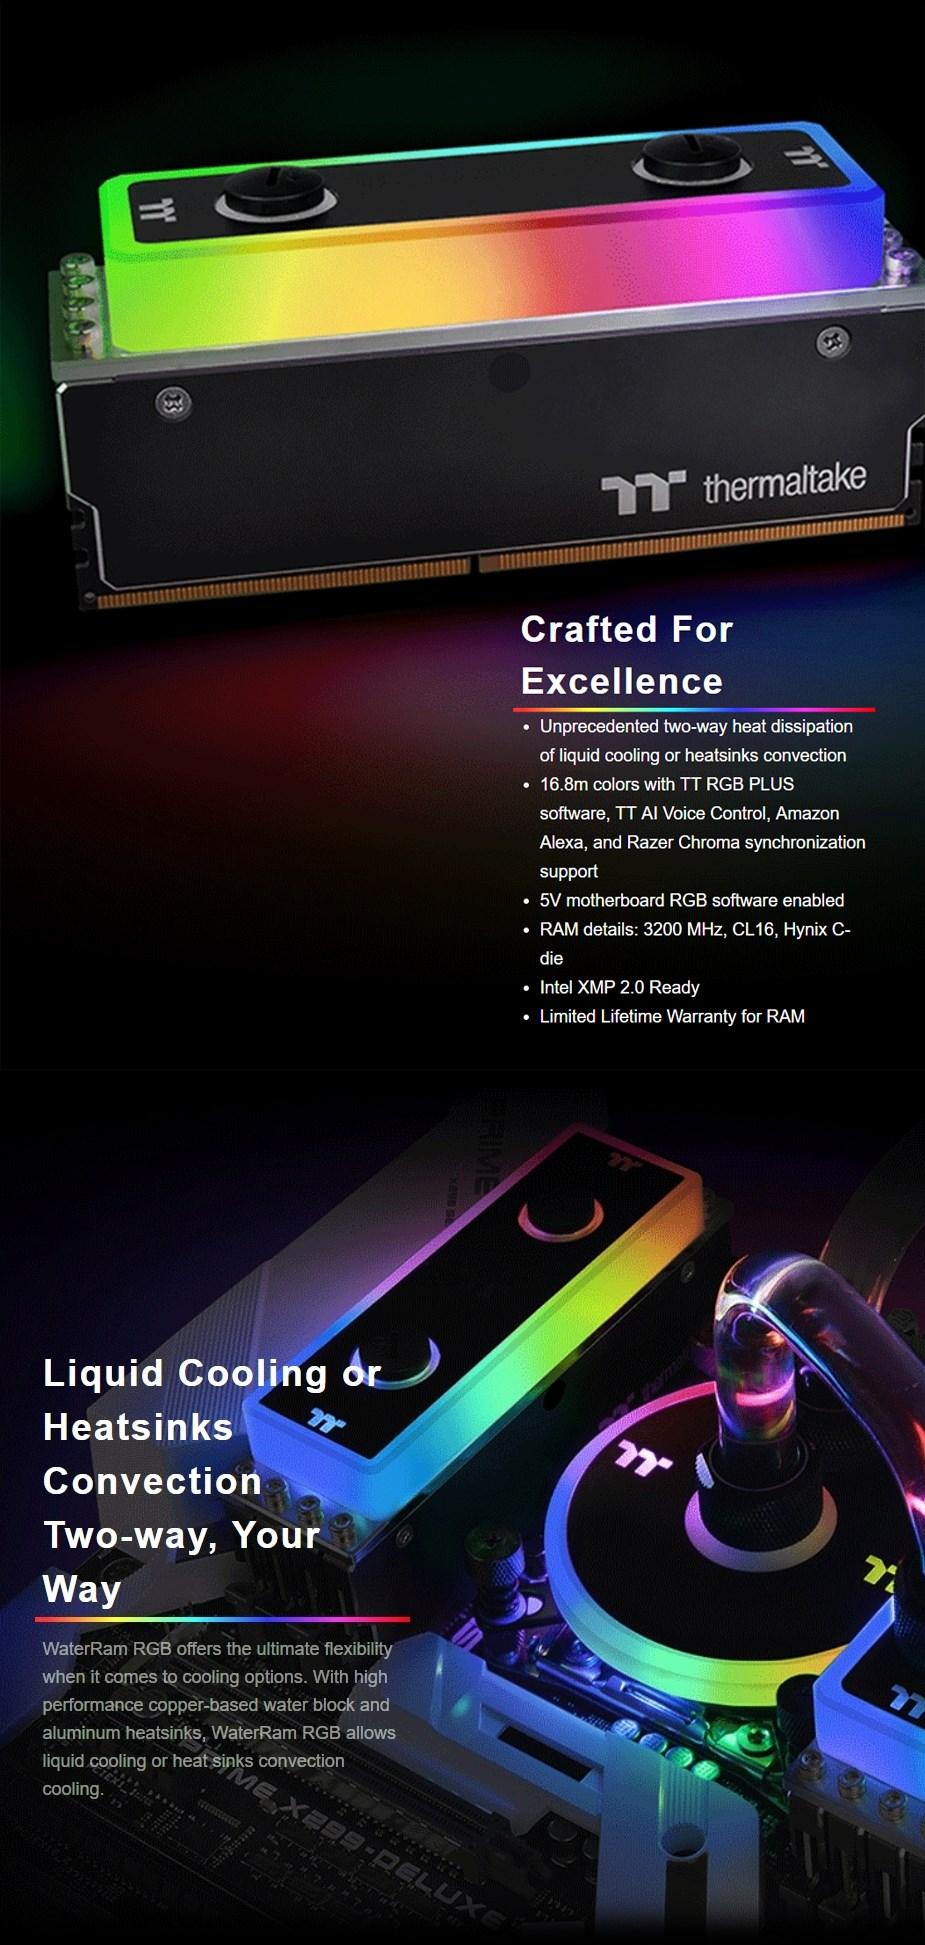 Thermaltake WaterRam 16GB (2x 8GB) 3200MHz DDR4 Liquid Cooled Memory - Desktop Overview 3